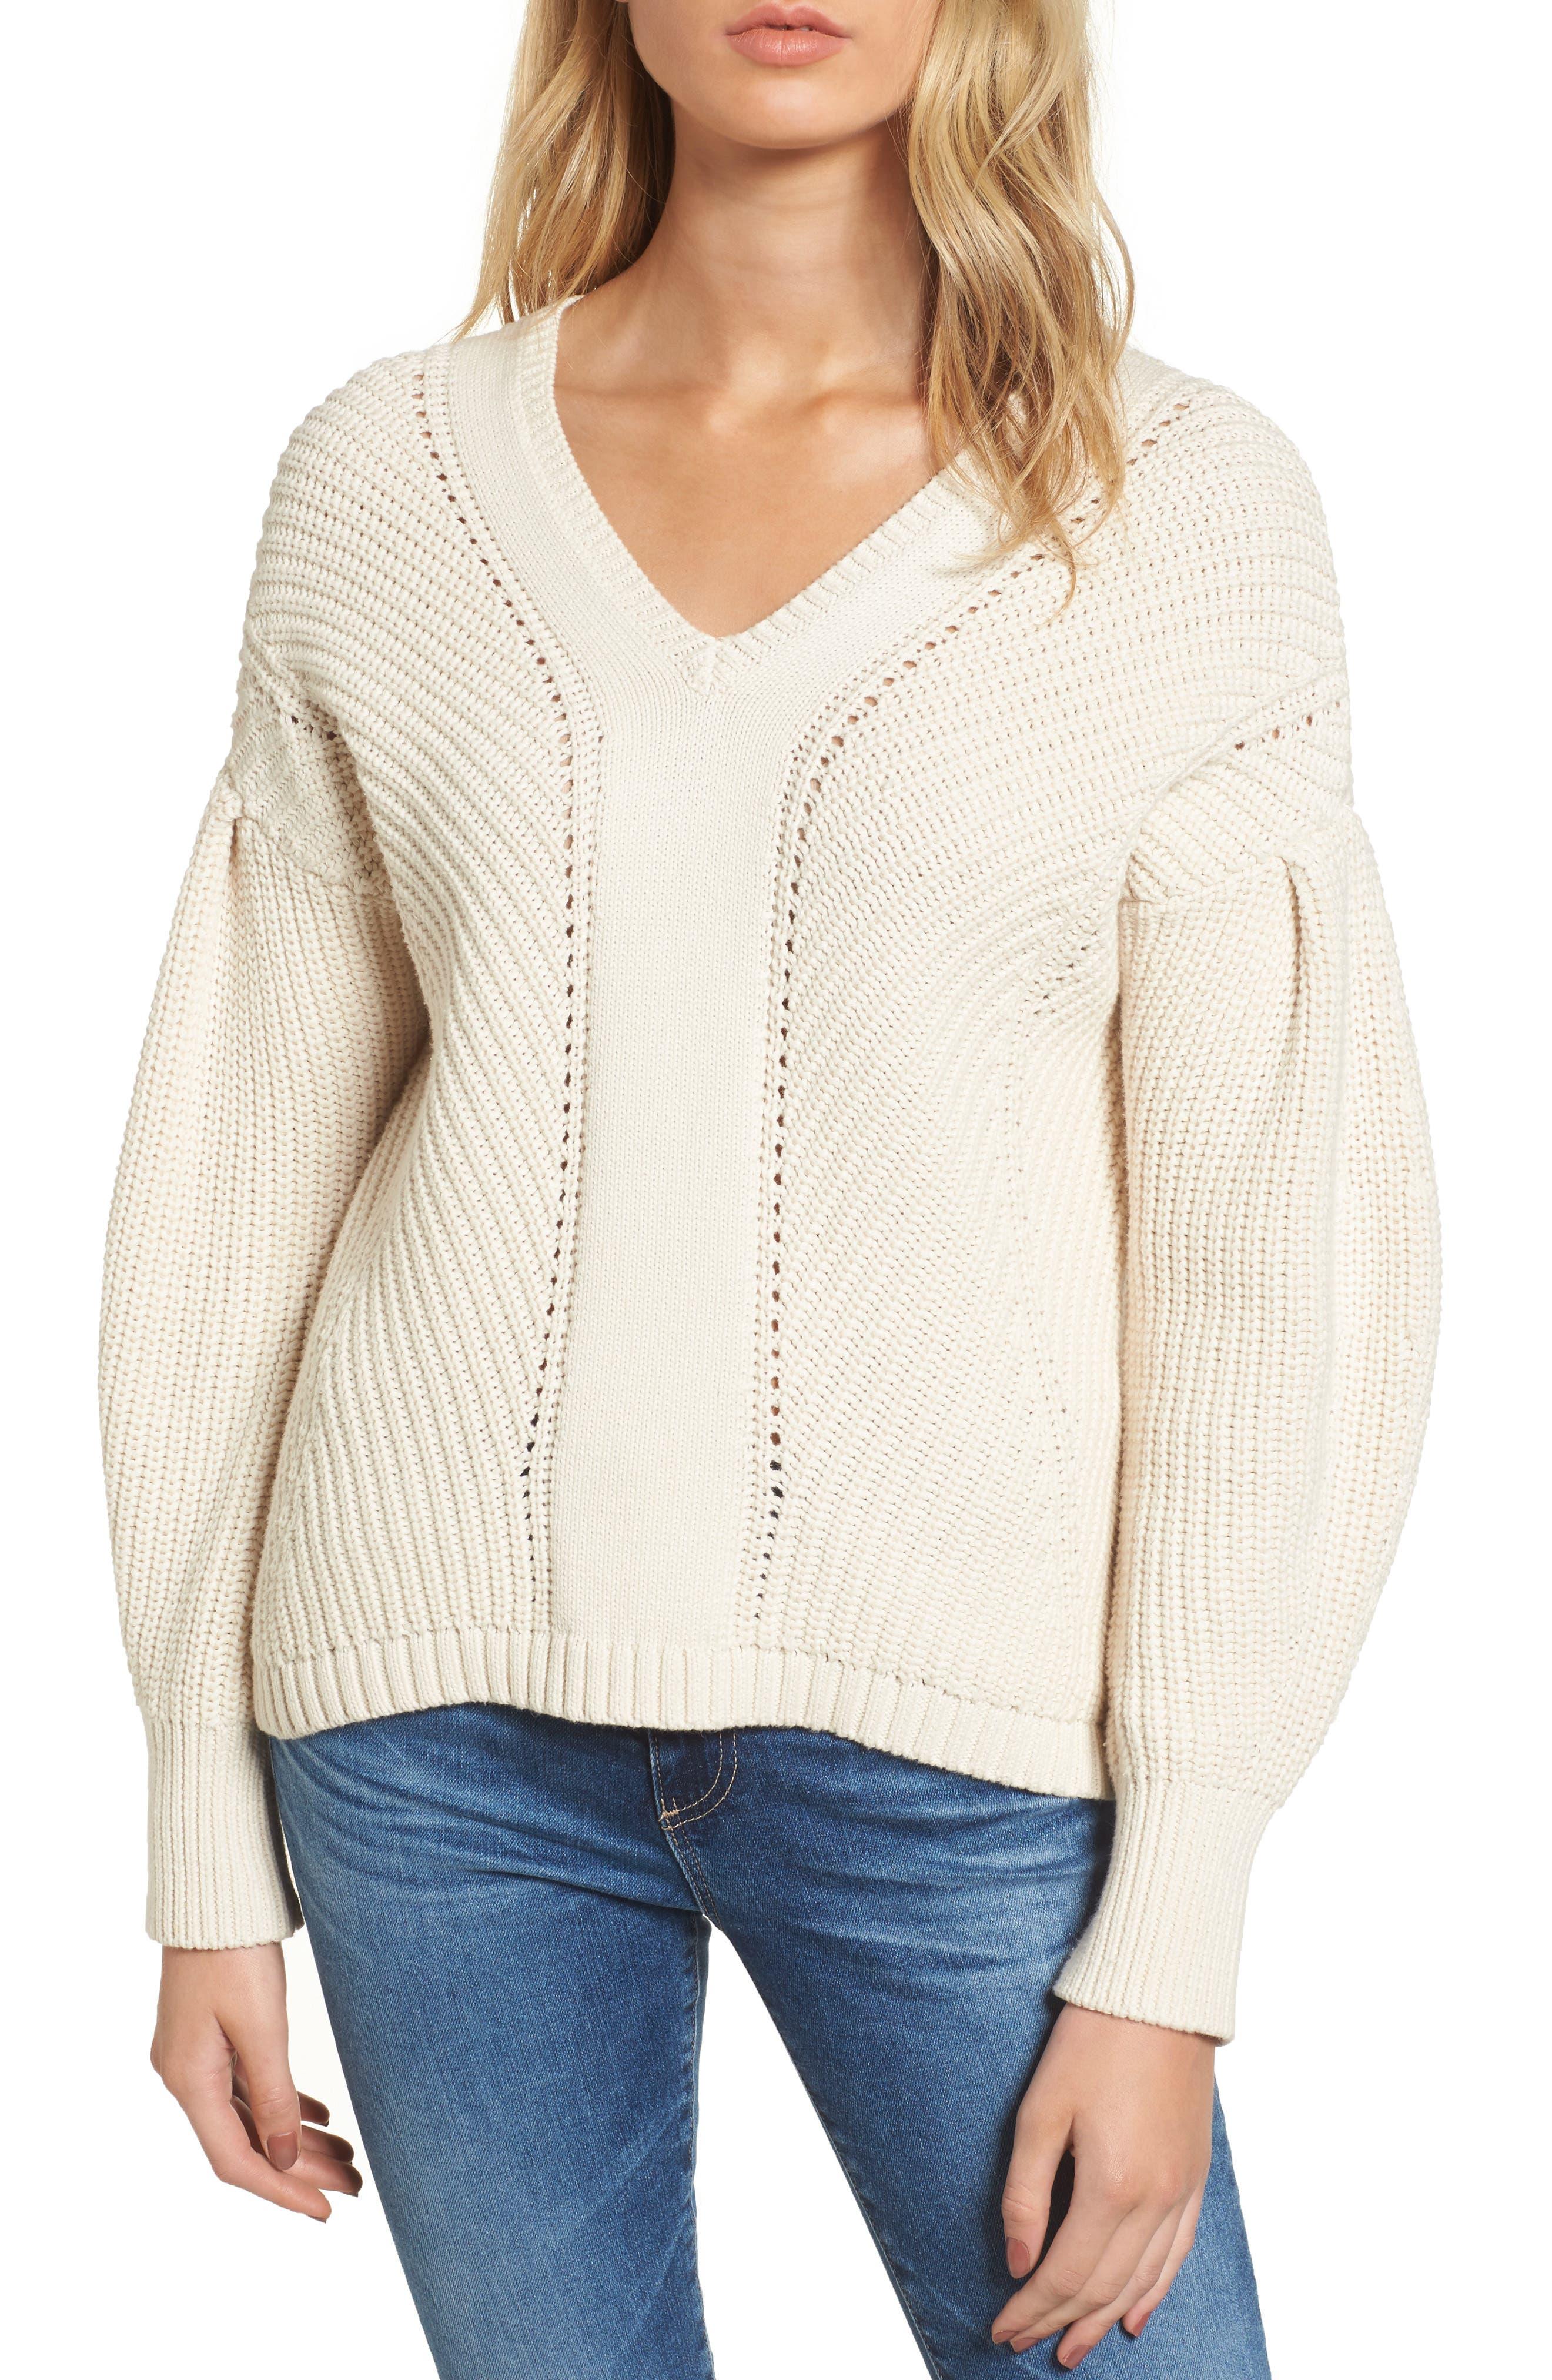 Millie Mozart Sweater,                             Main thumbnail 1, color,                             Classic Cream